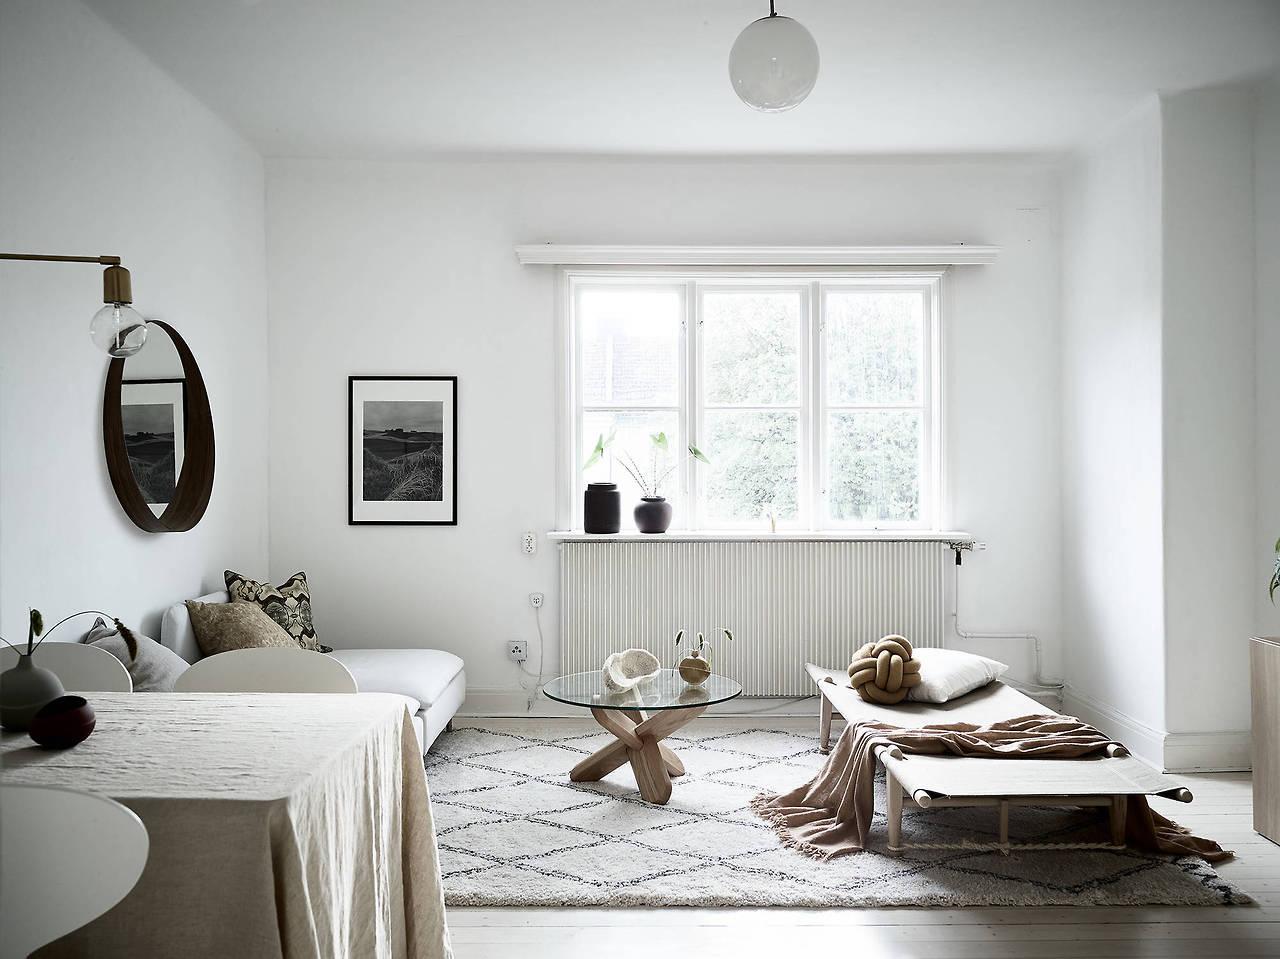 New Dreamy Ikea Bathroom Daily Dream Decor: Dreamy Warm Scandinavian Apartment